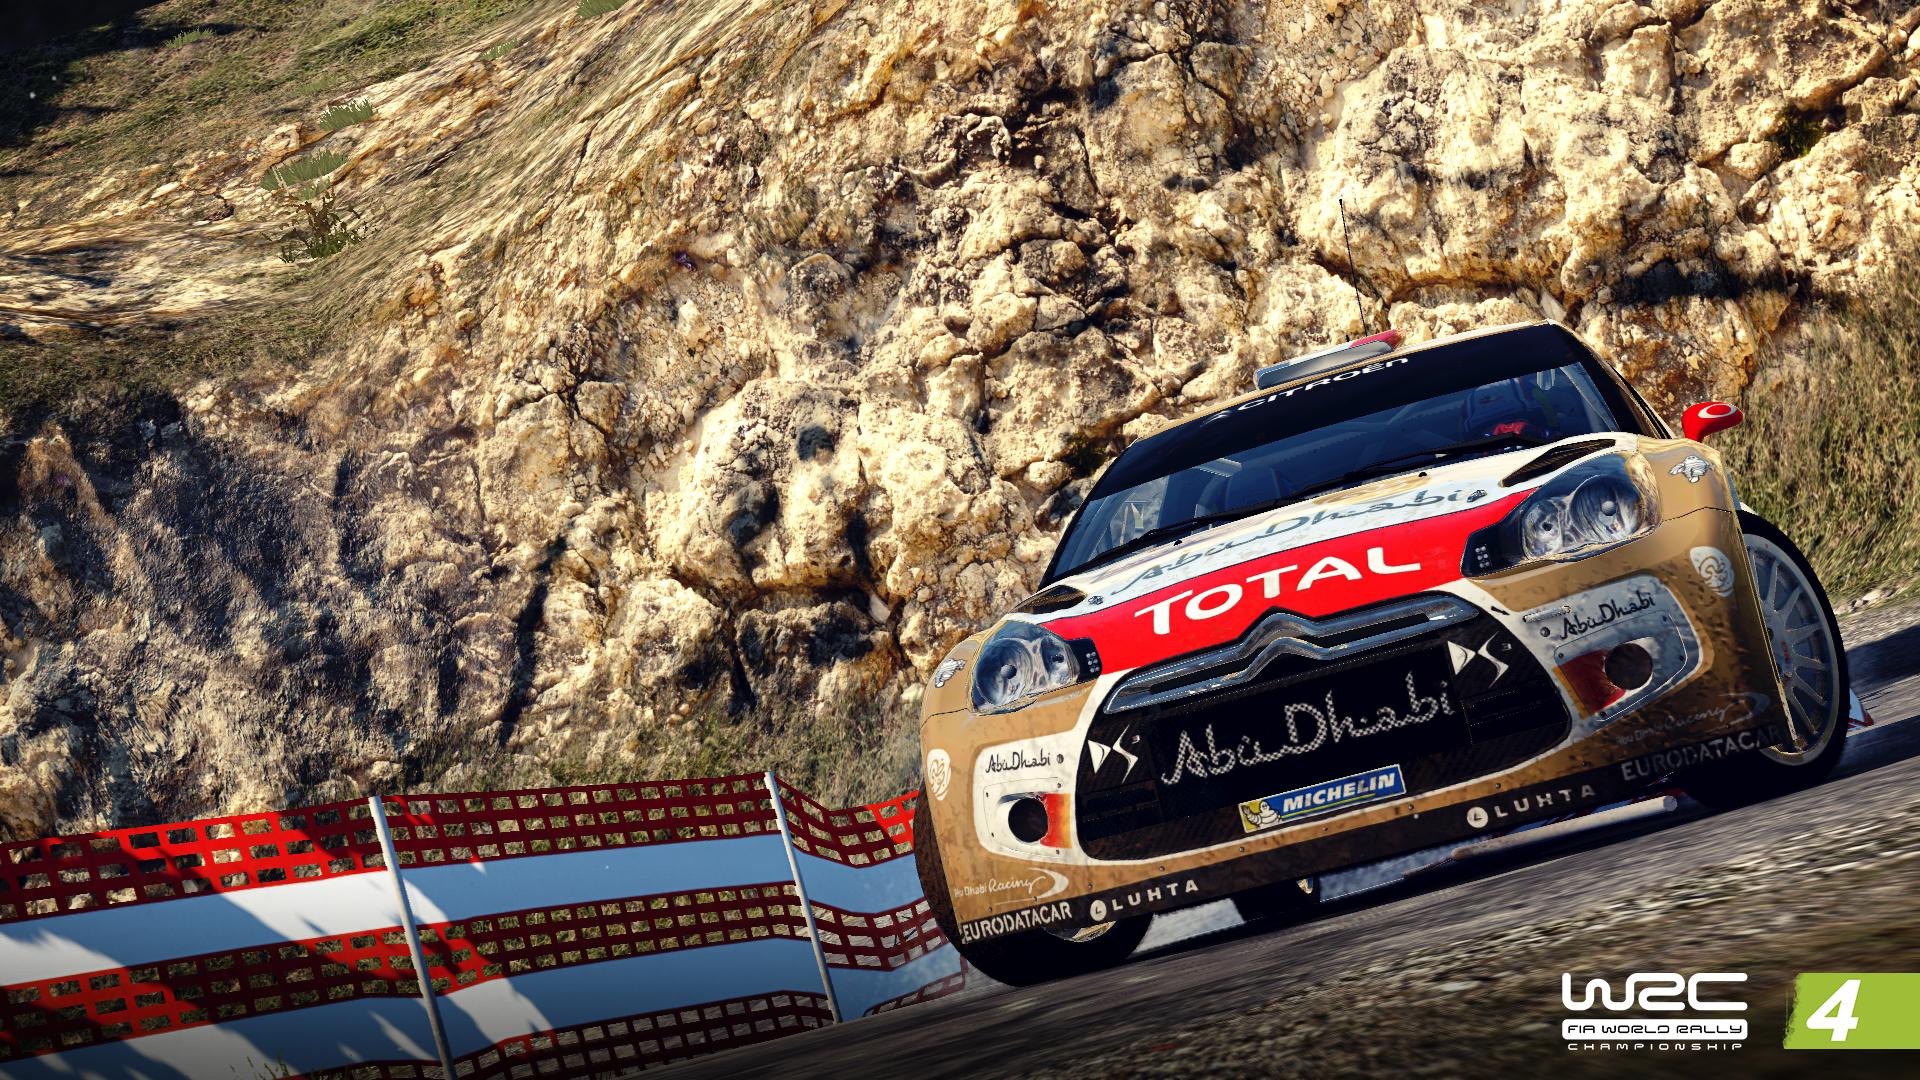 [PC Multi] WRC 4 FIA World Rally Championship – RELOADED |Uptobox Uploaded